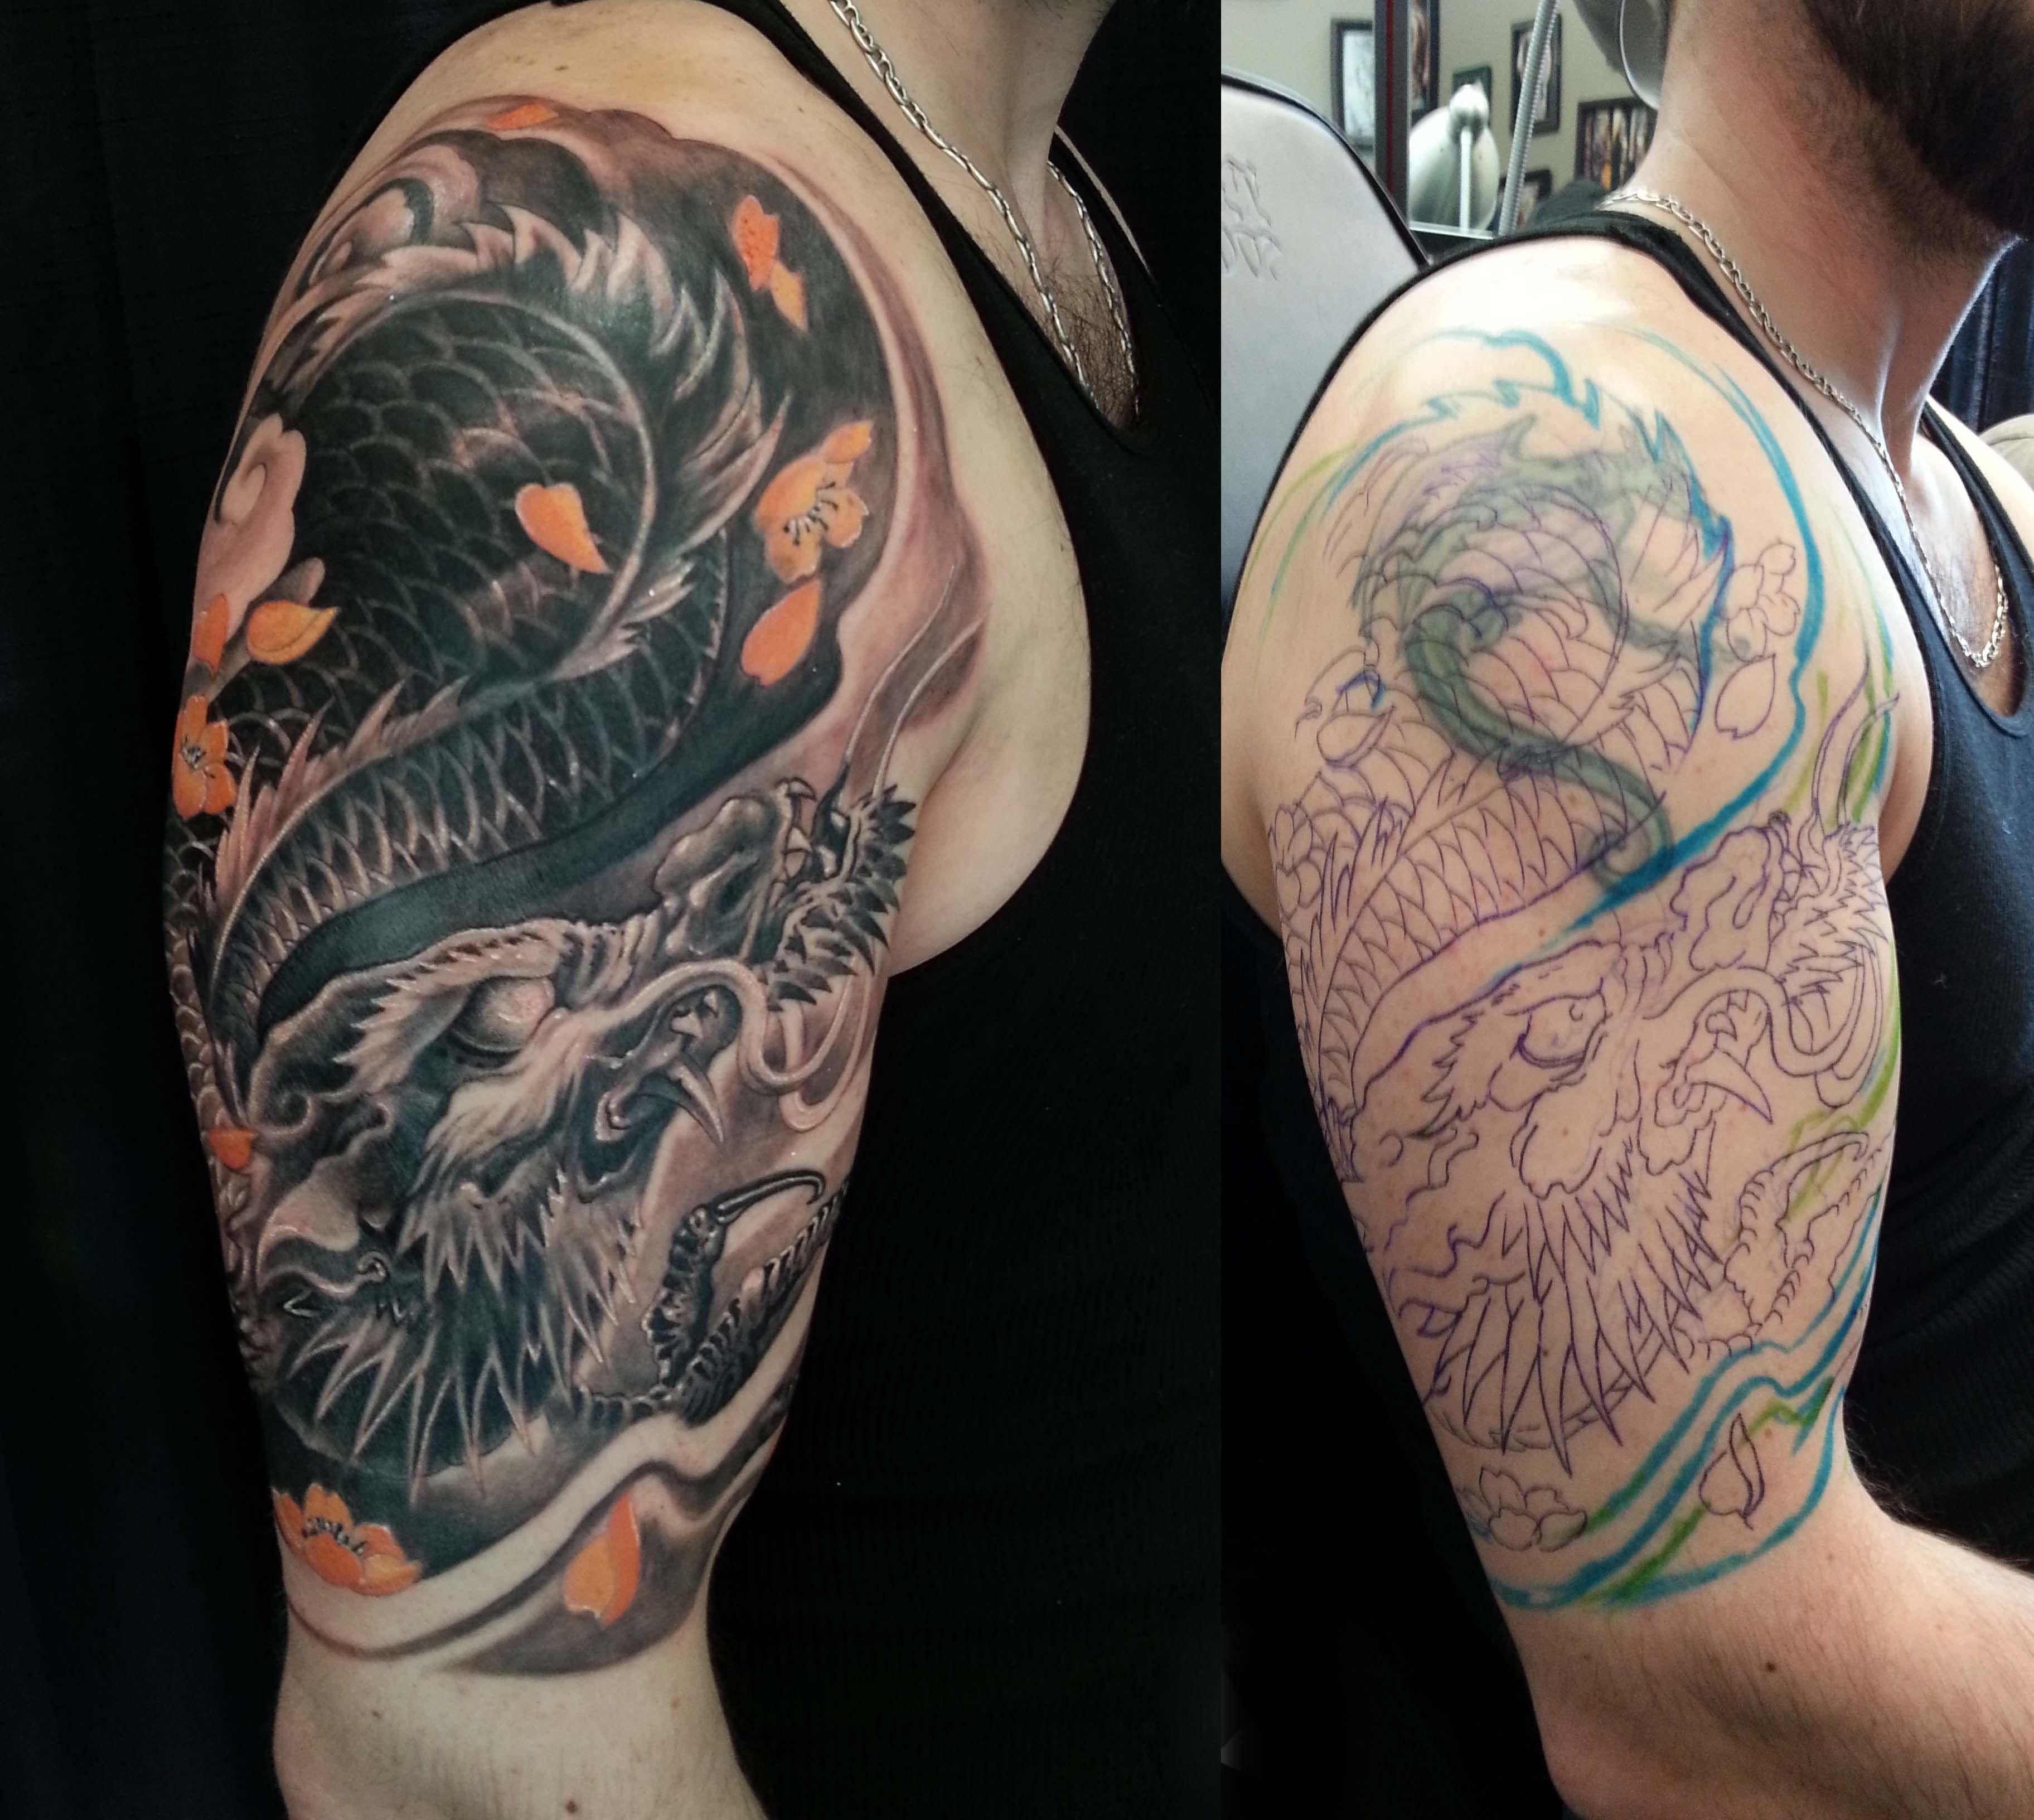 Tattoo Sleeve Cover